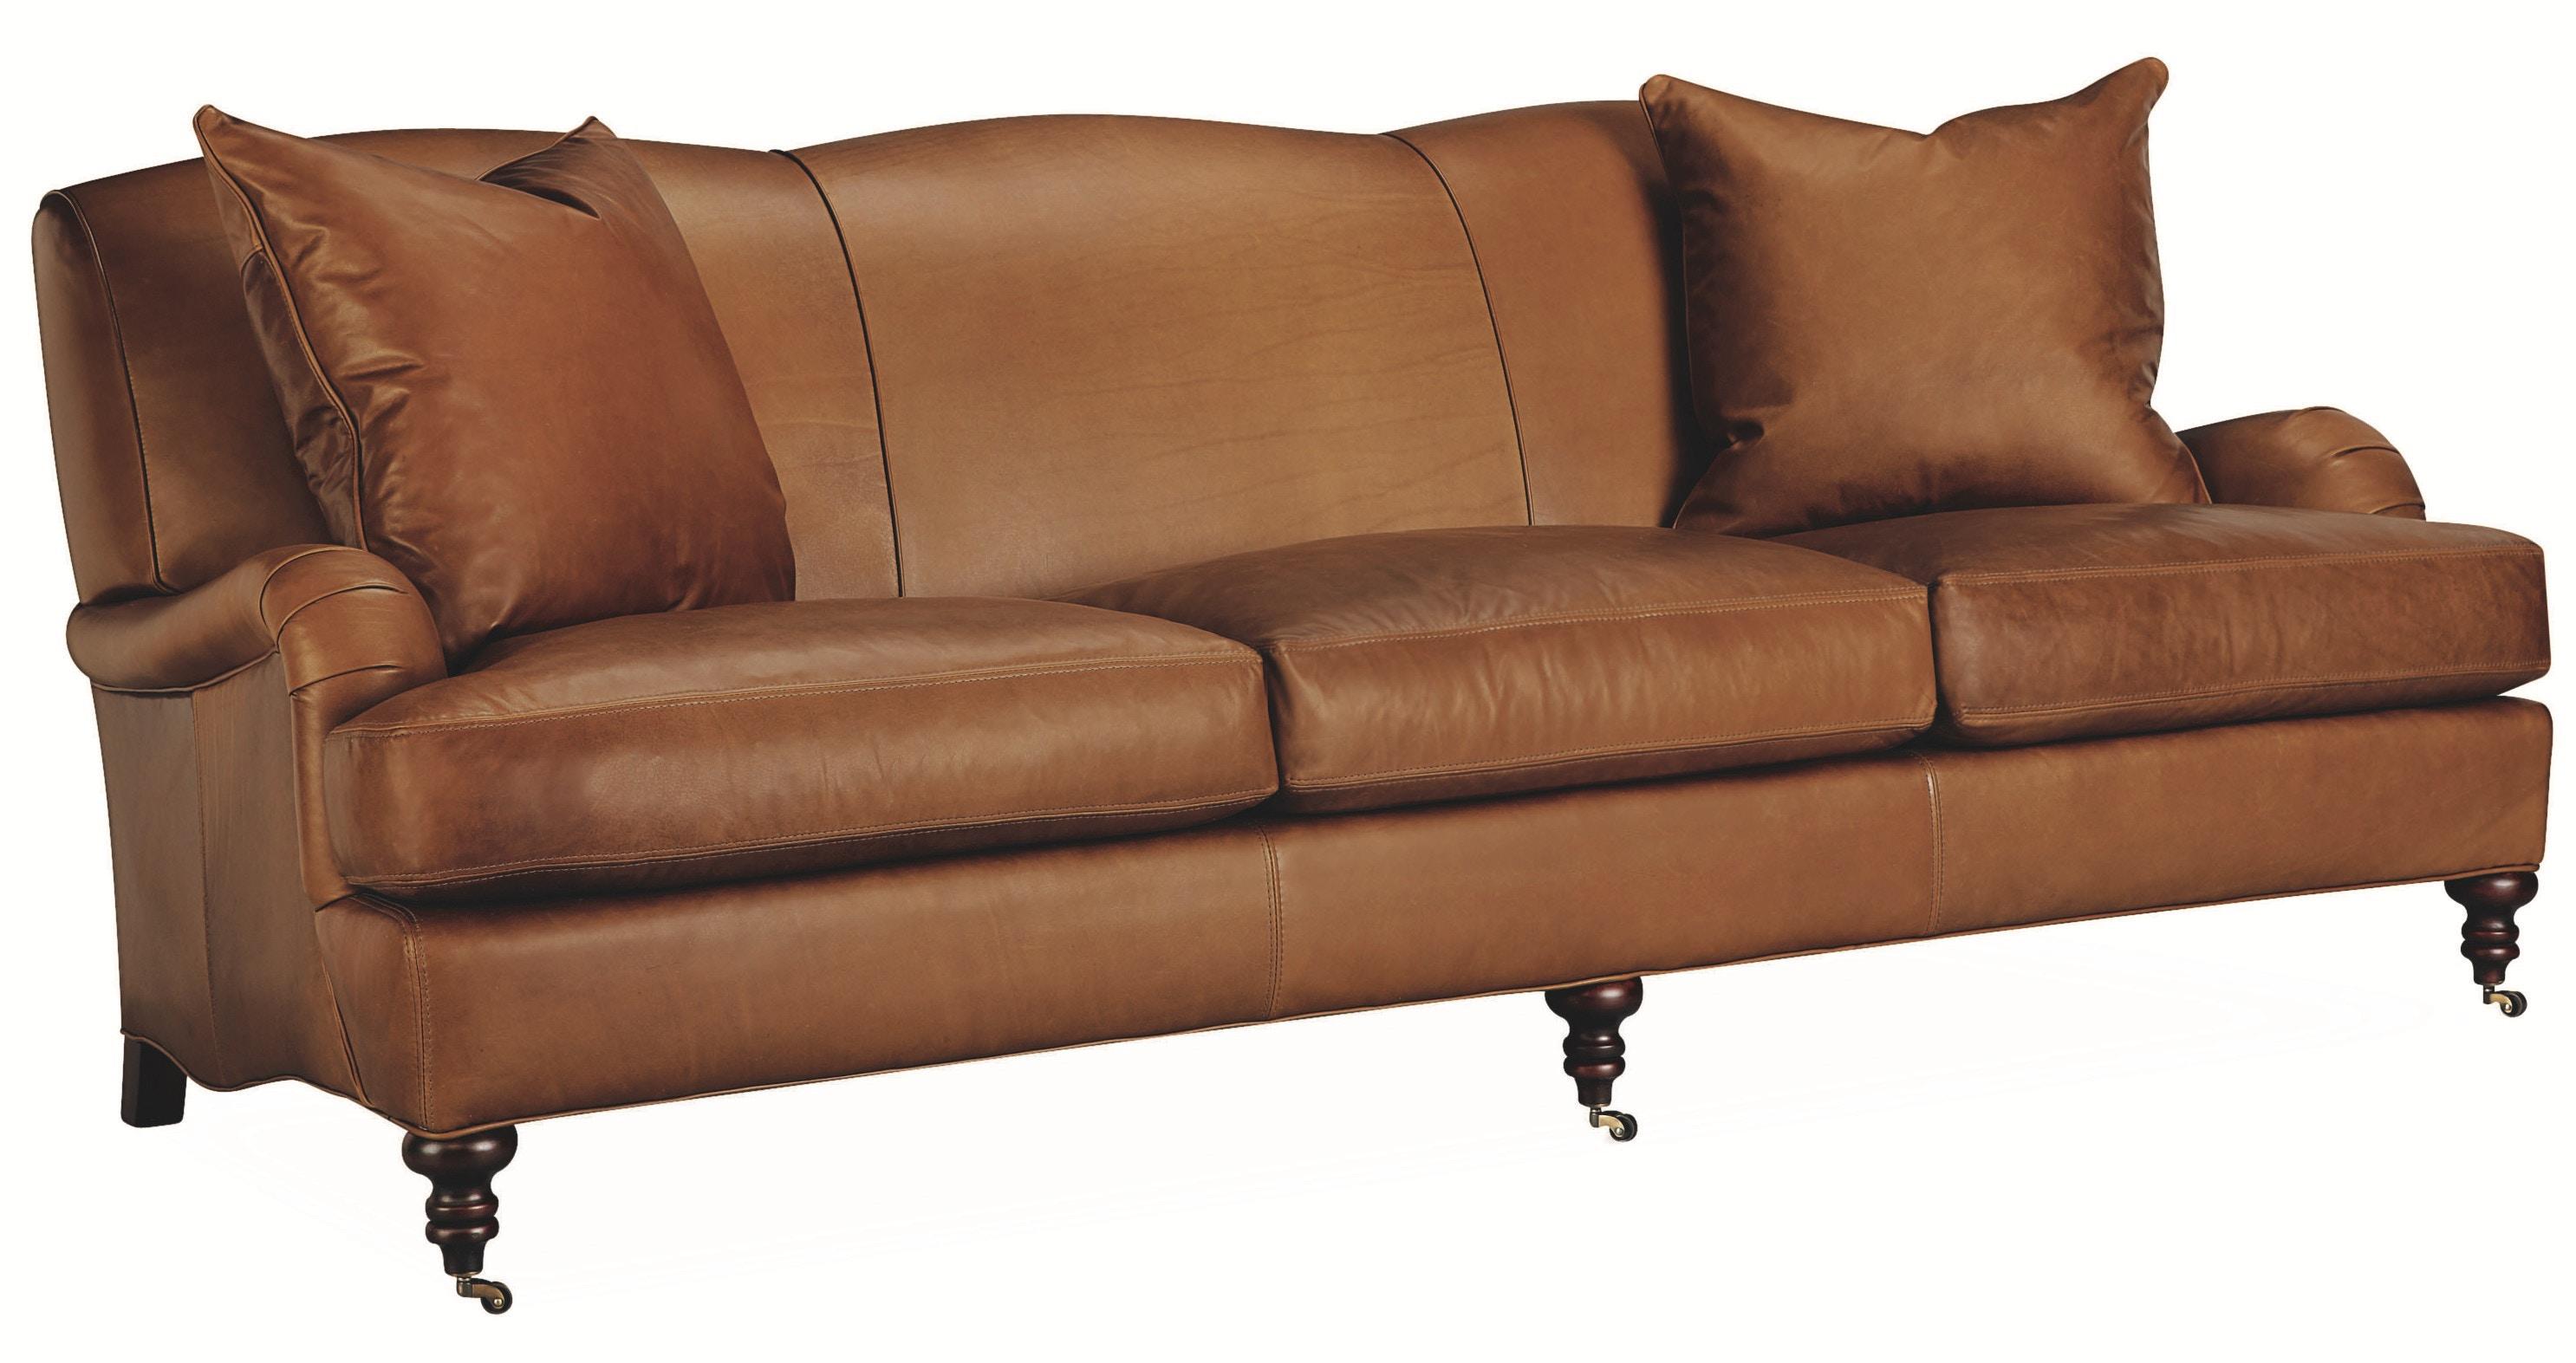 Lee Industries Living Room Leather Sofa L3278 03   Meg Brown Home  Furnishings   Advance, Winston Salem, Greensboro And Lexington, NC